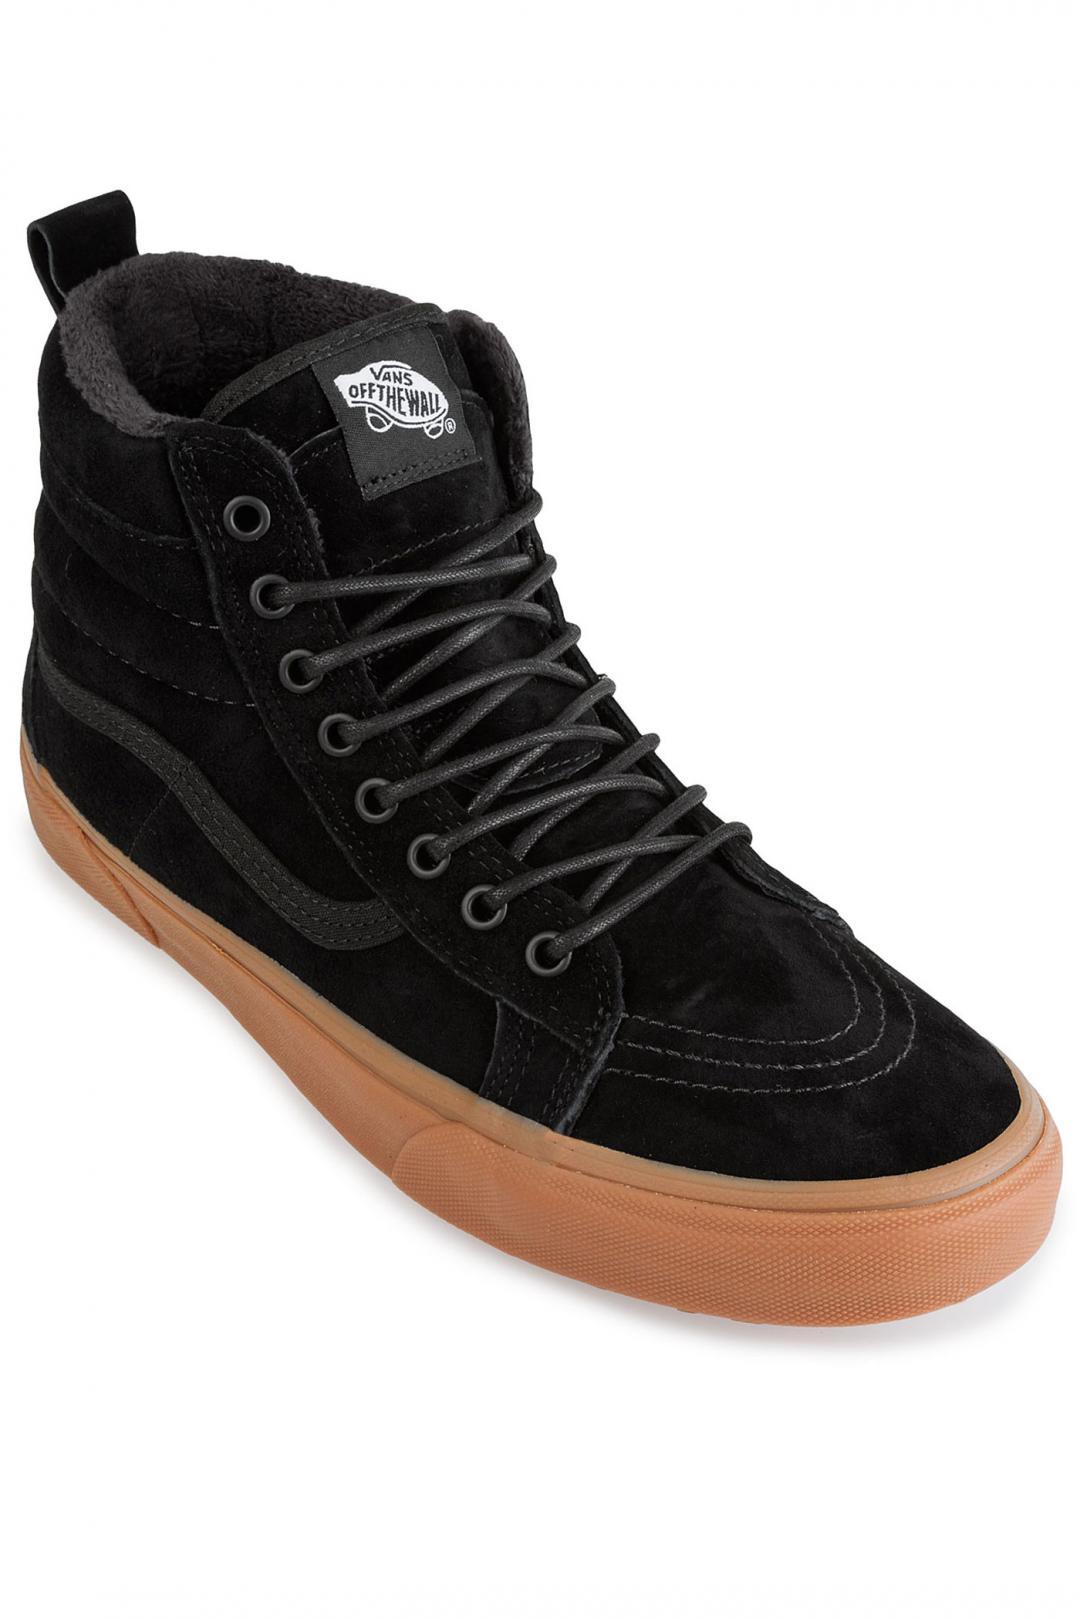 Uomo Vans Sk8-Hi MTE black gum | Sneaker